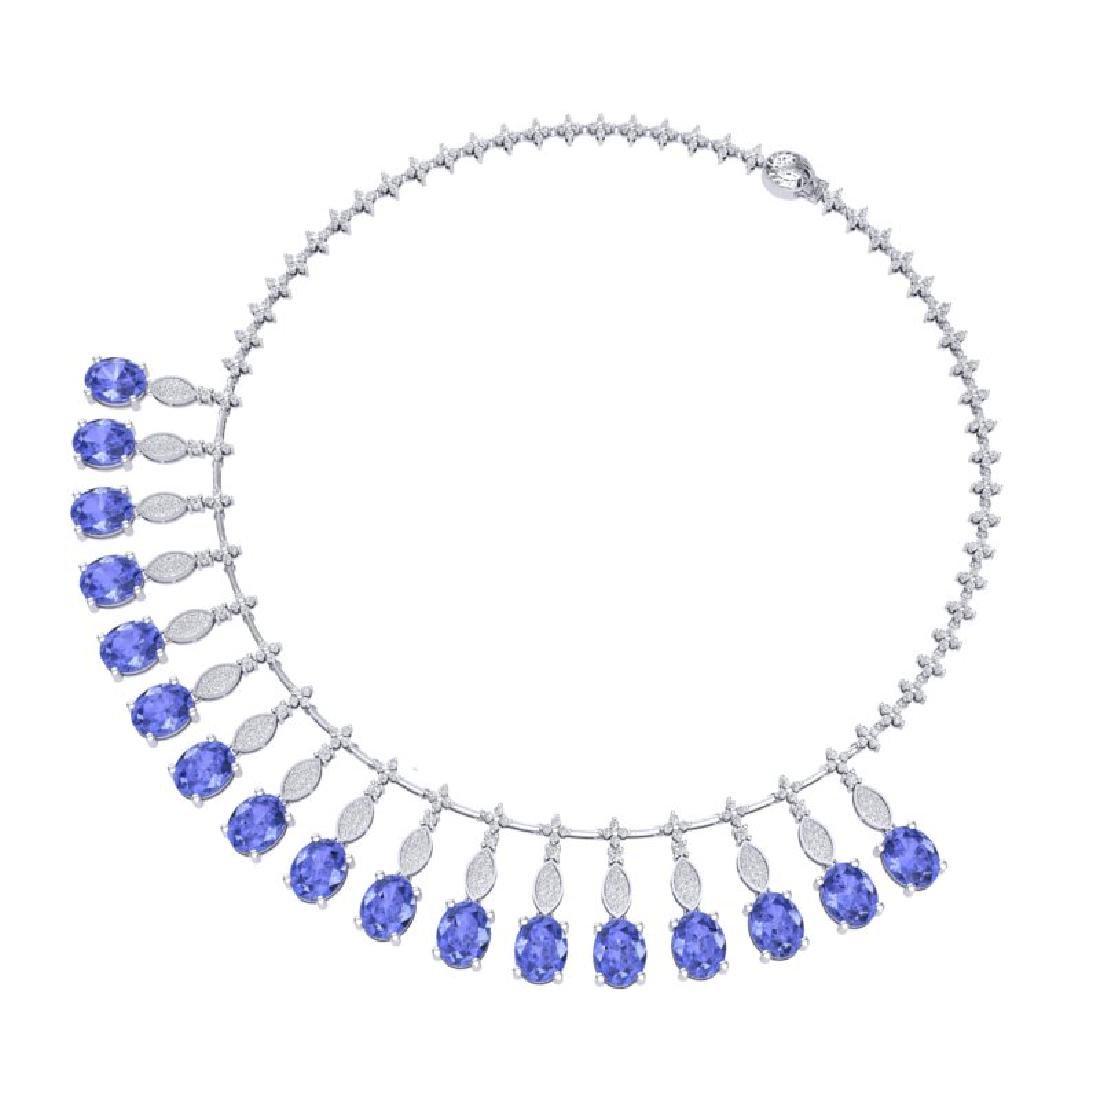 57.15 CTW Royalty Tanzanite & VS Diamond Necklace 18K - 2